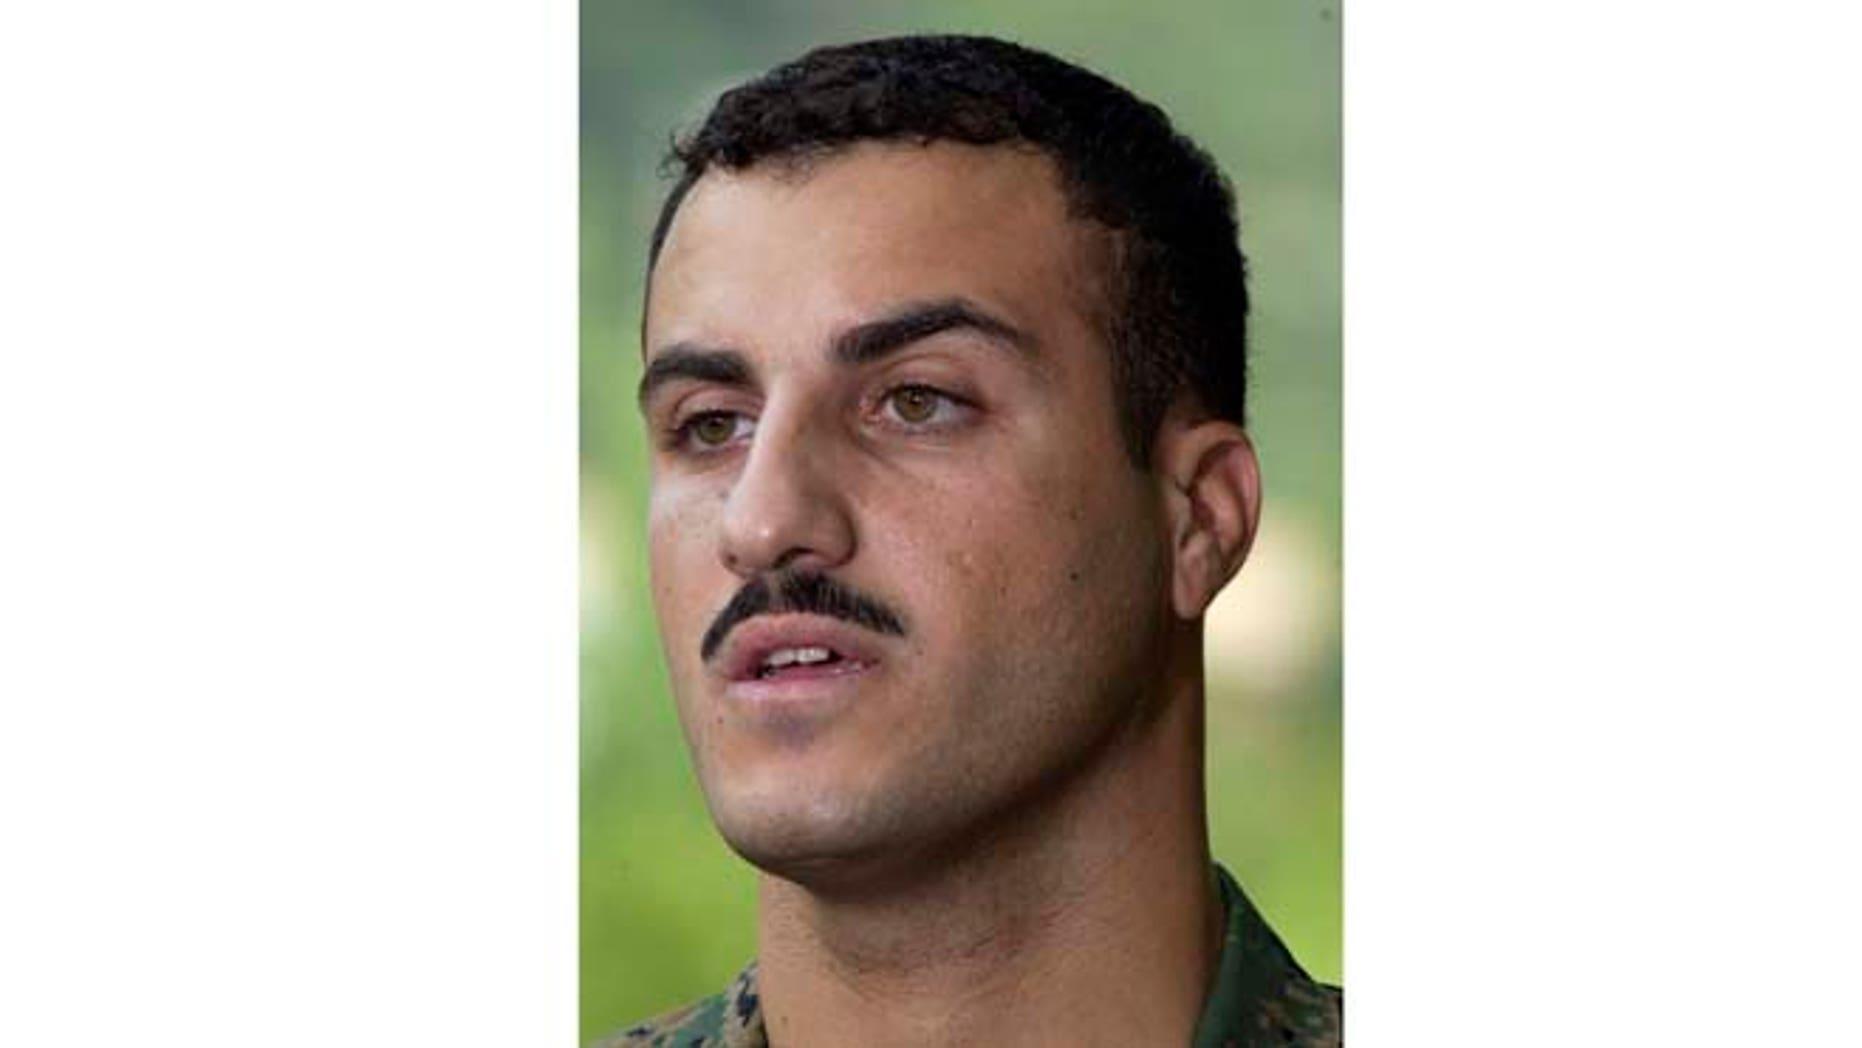 July 19, 200: In this file photo, Marine Cpl. Wassef Ali Hassoun makes a statement to the press outside Quantico Marine Base in Quantico, Va. (AP)